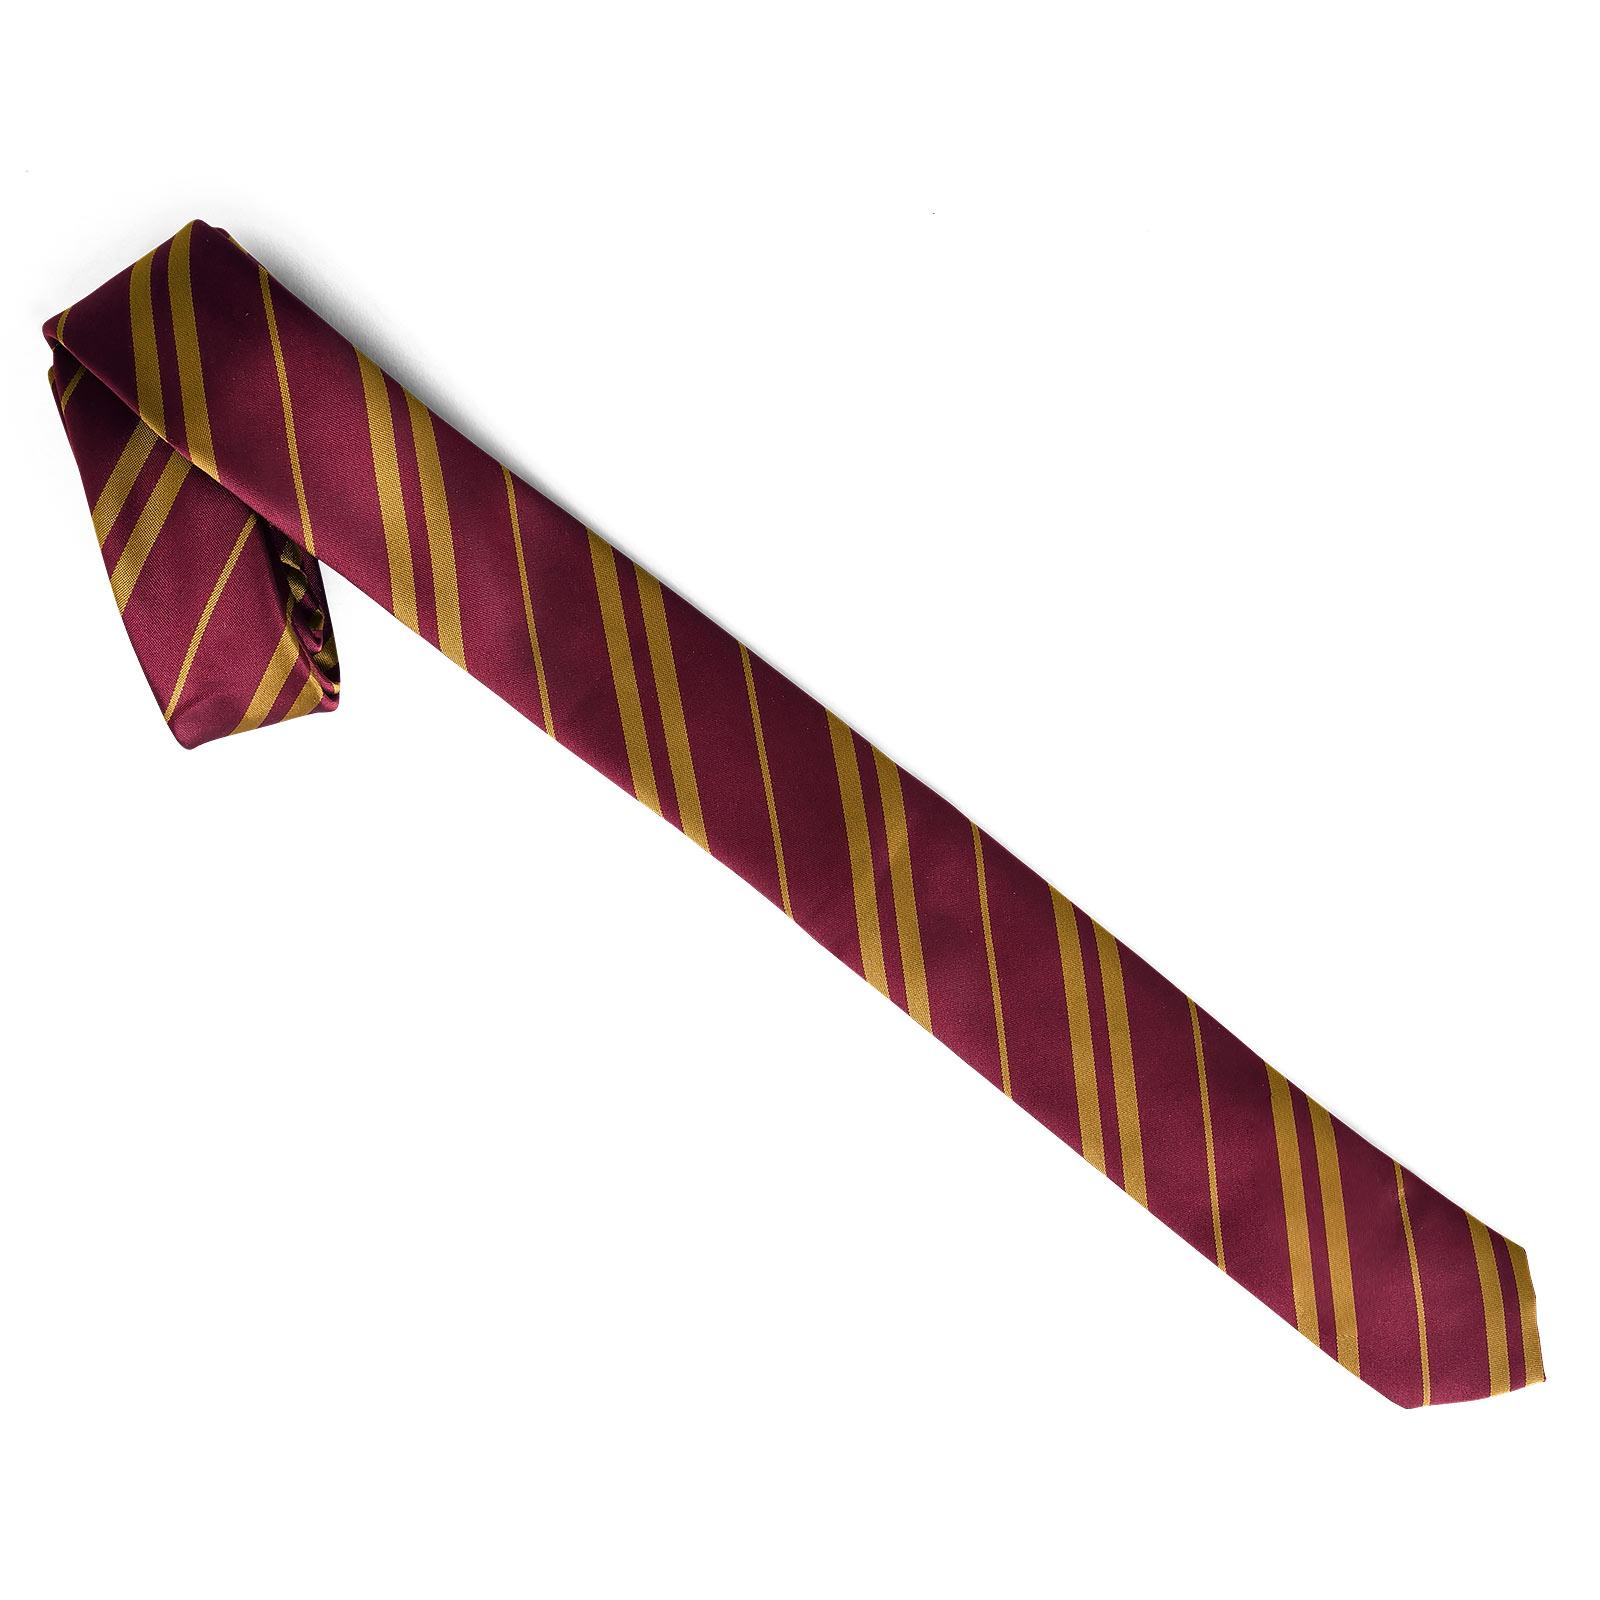 Harry Potter - Schmale Gryffindor Krawatte